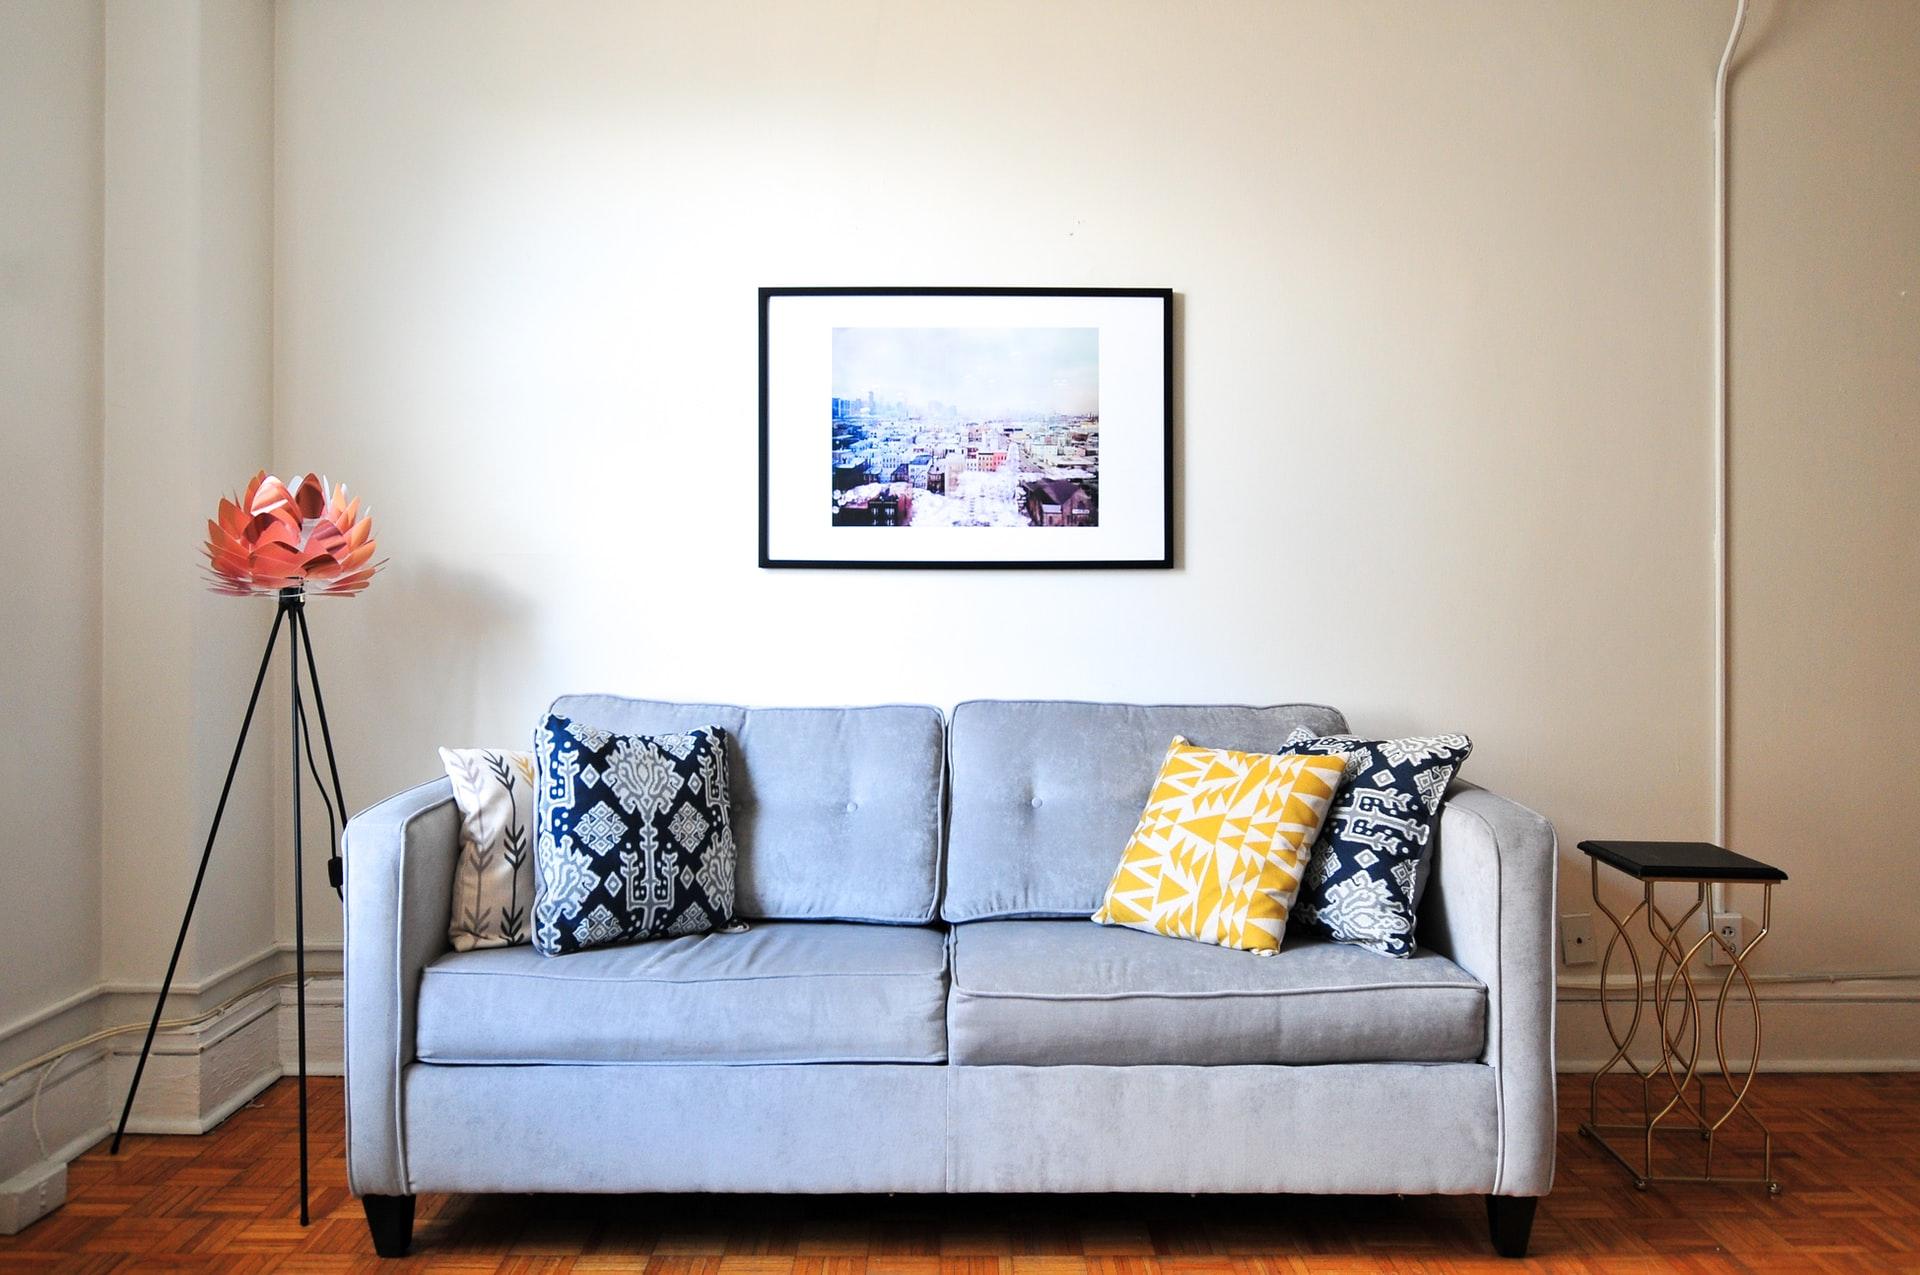 Guide to storing furniture in Manhattan